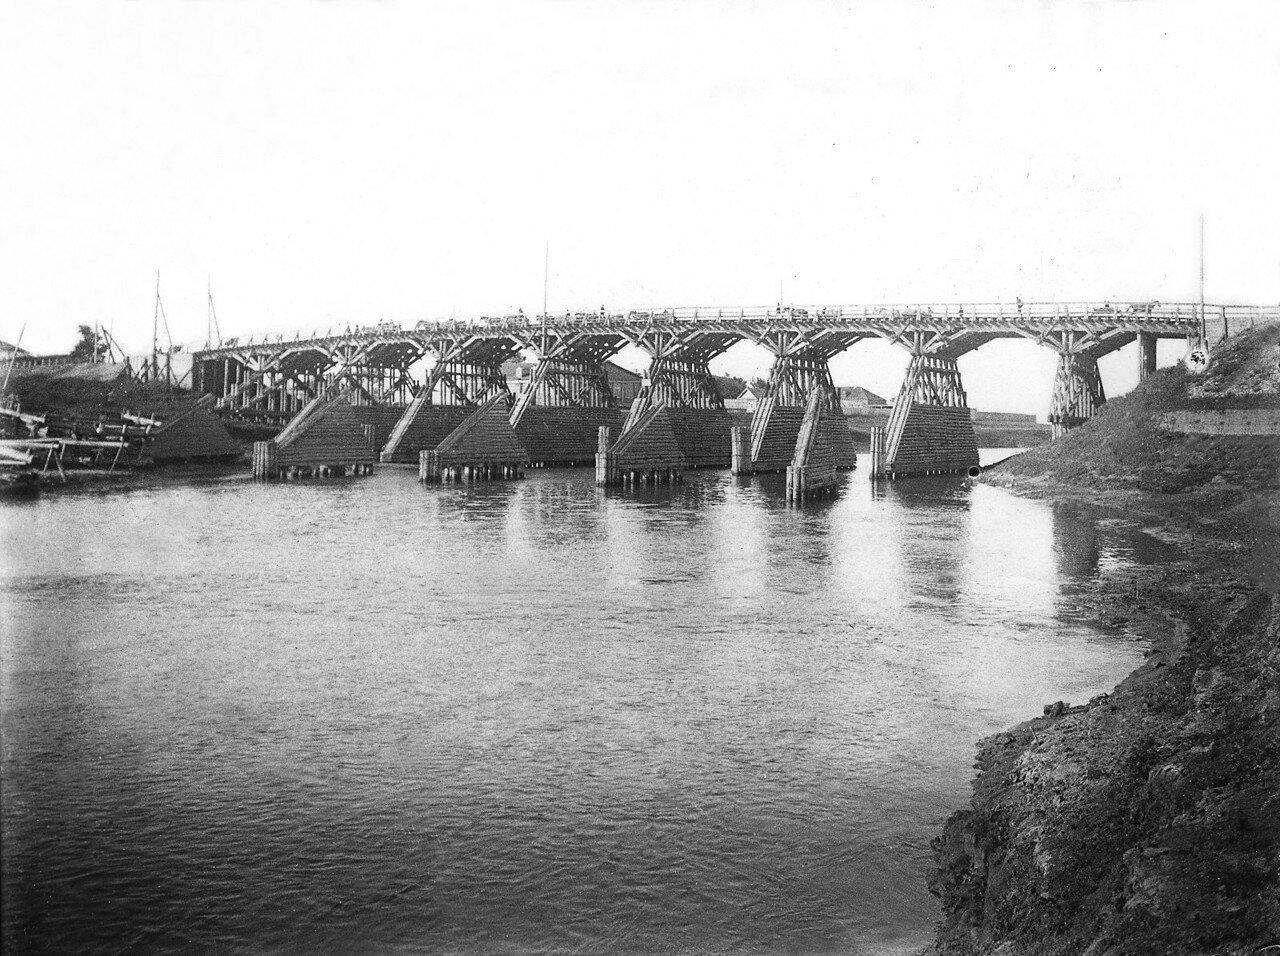 Кизический (Хижицкий) мост